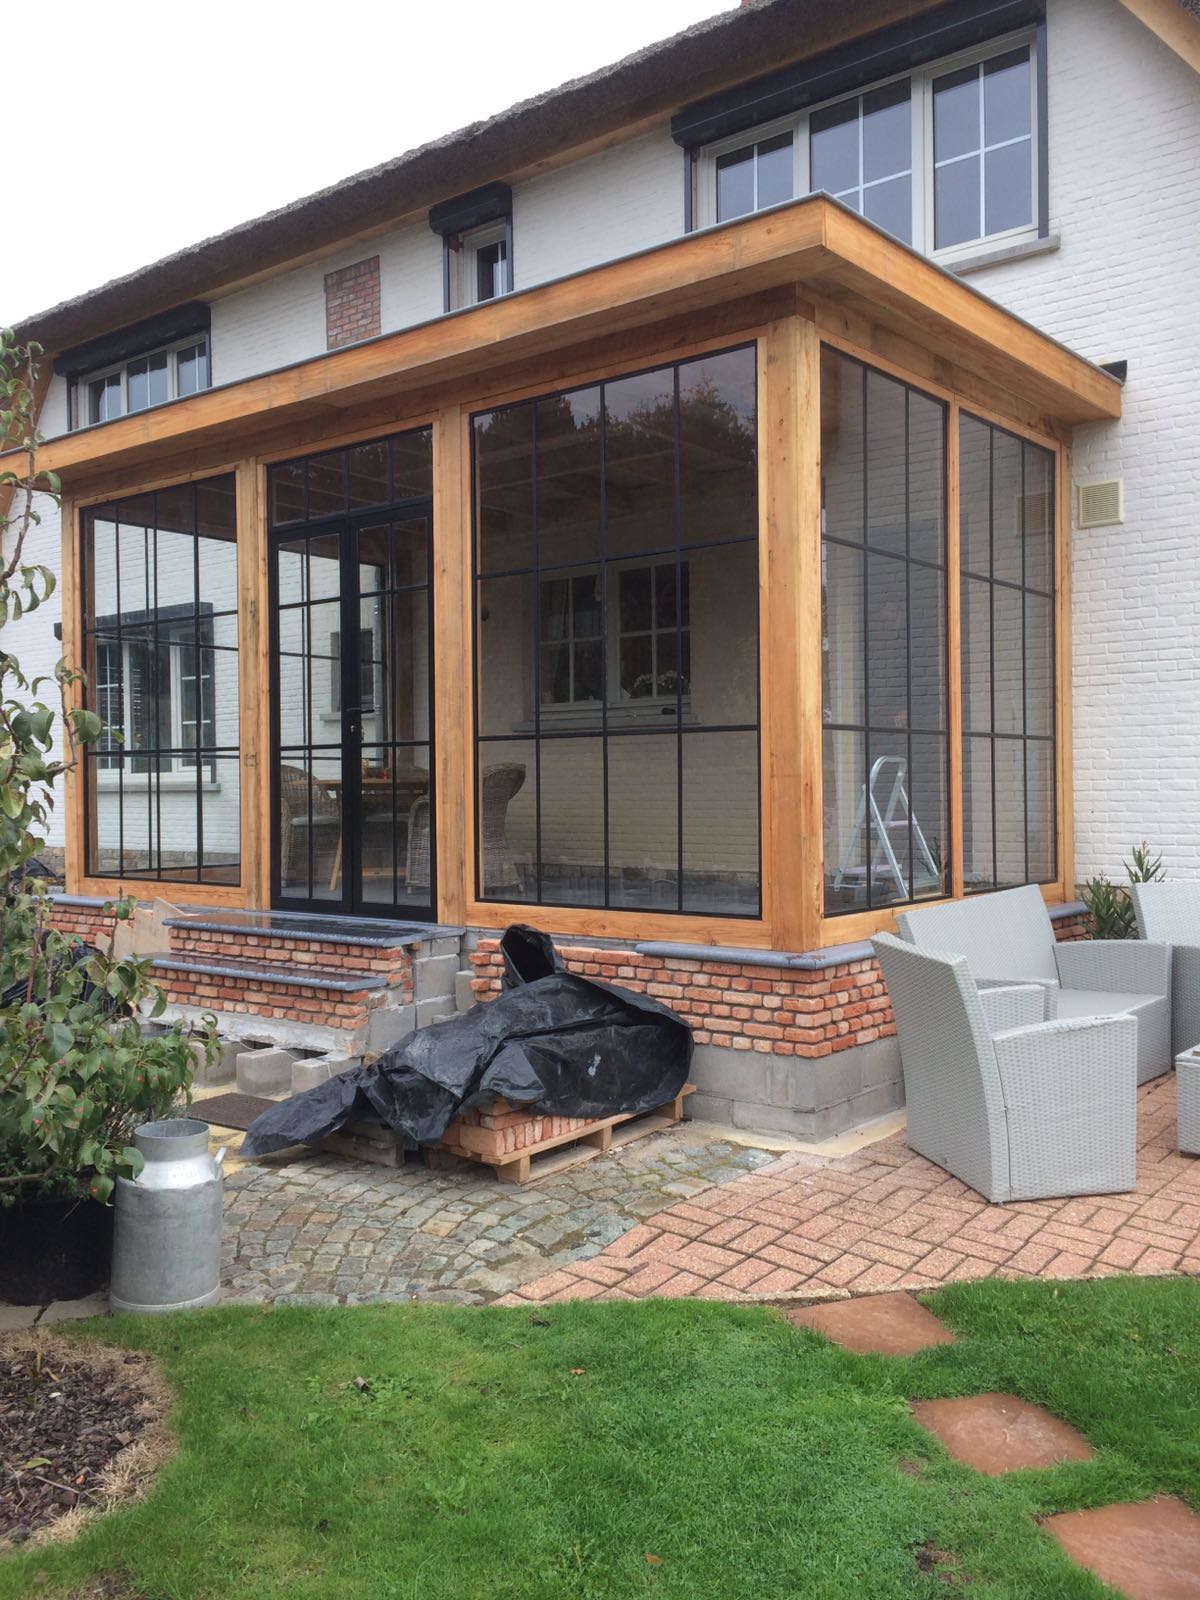 houten-tuinkamer-serre-3 - Project Belgiè gesloten tuinkamer-serre.